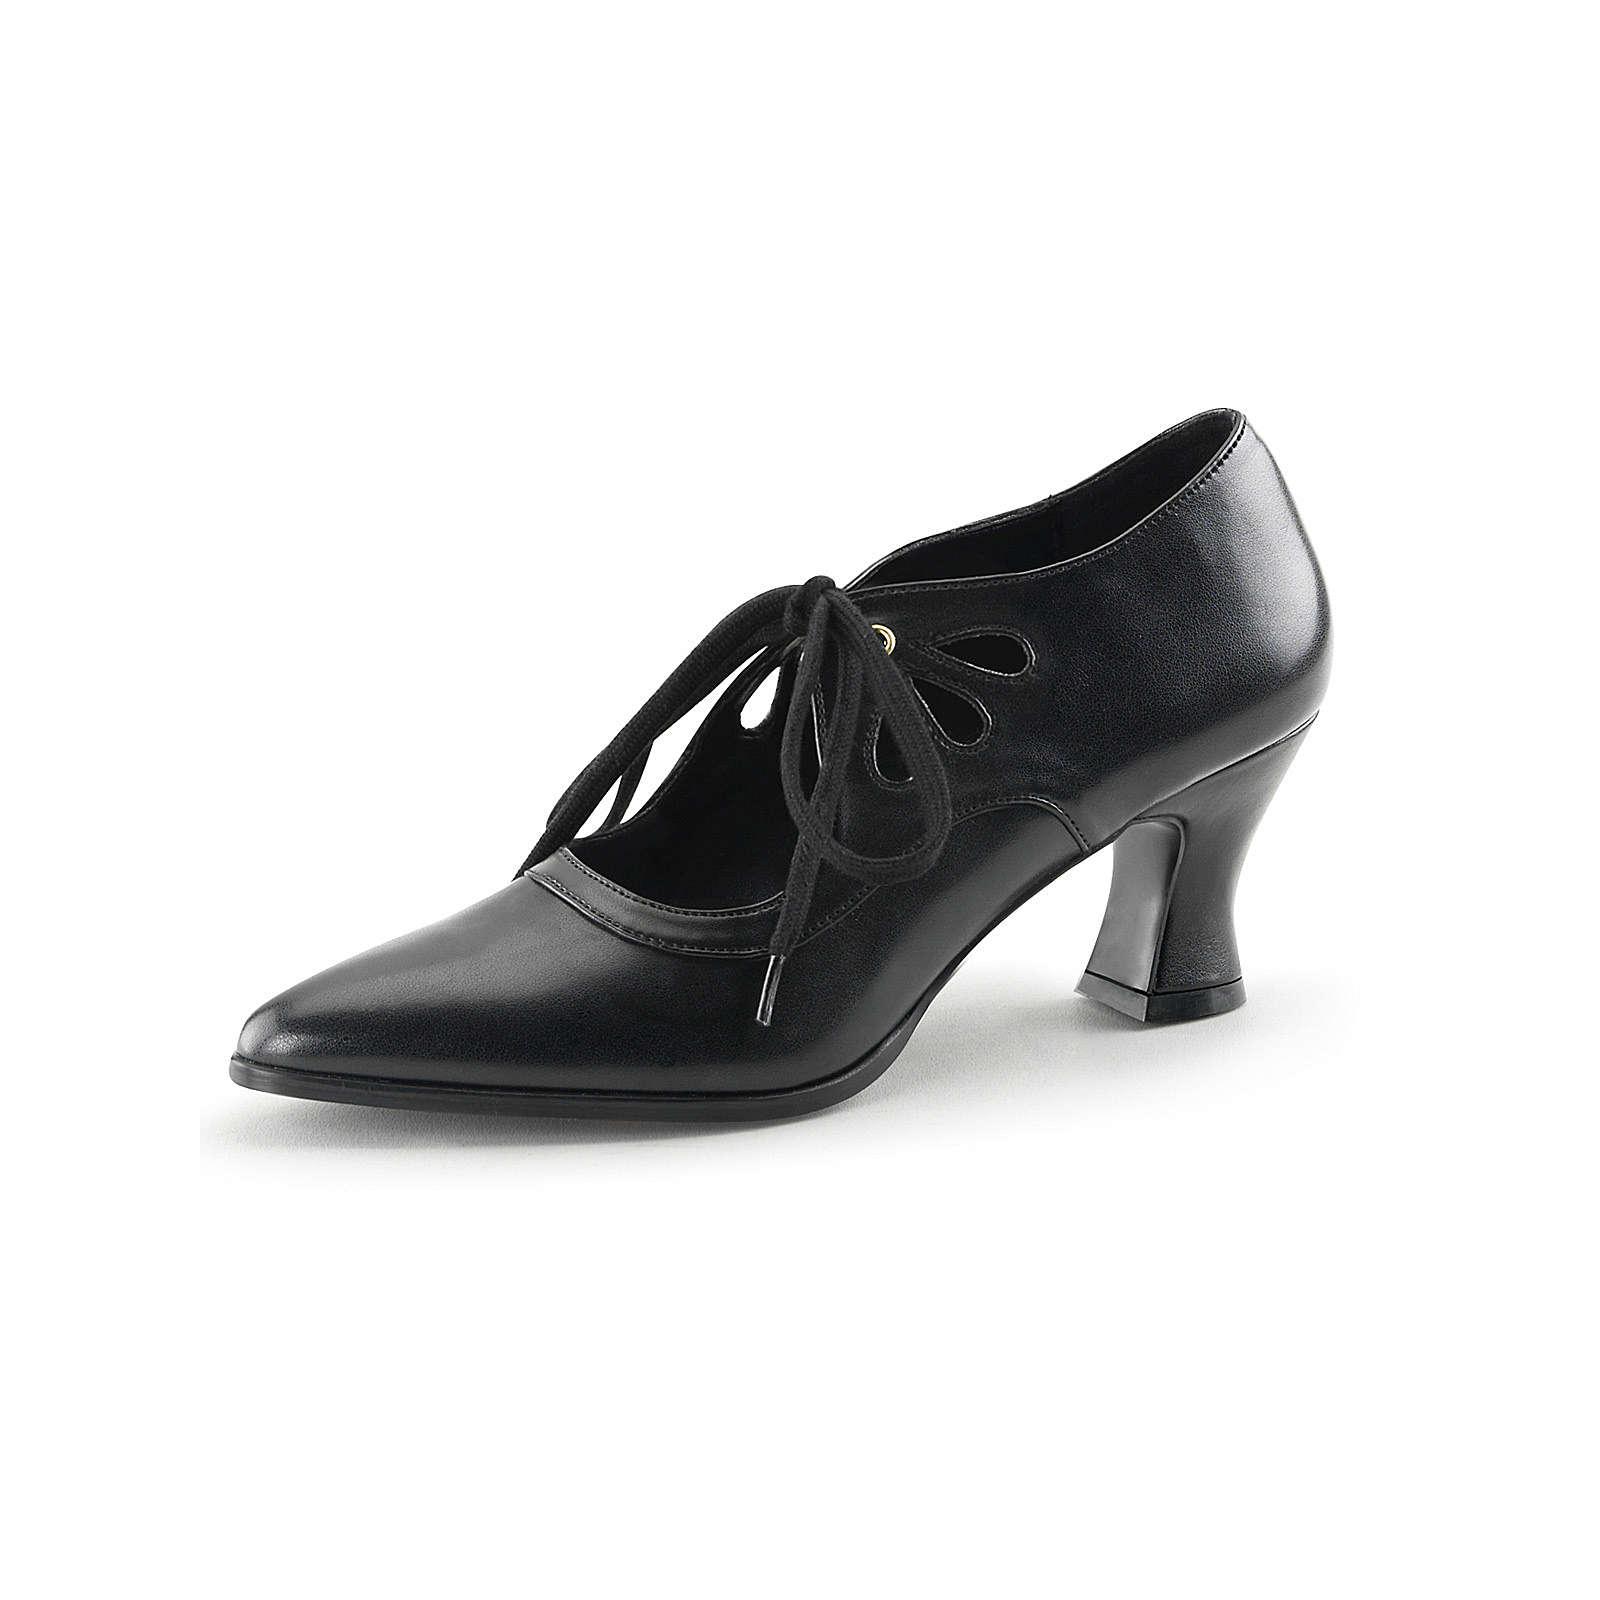 FUNTASMA® Kostümschuhe Viktorianisch Victorian Schnürpumps schwarz Damen Gr. 36